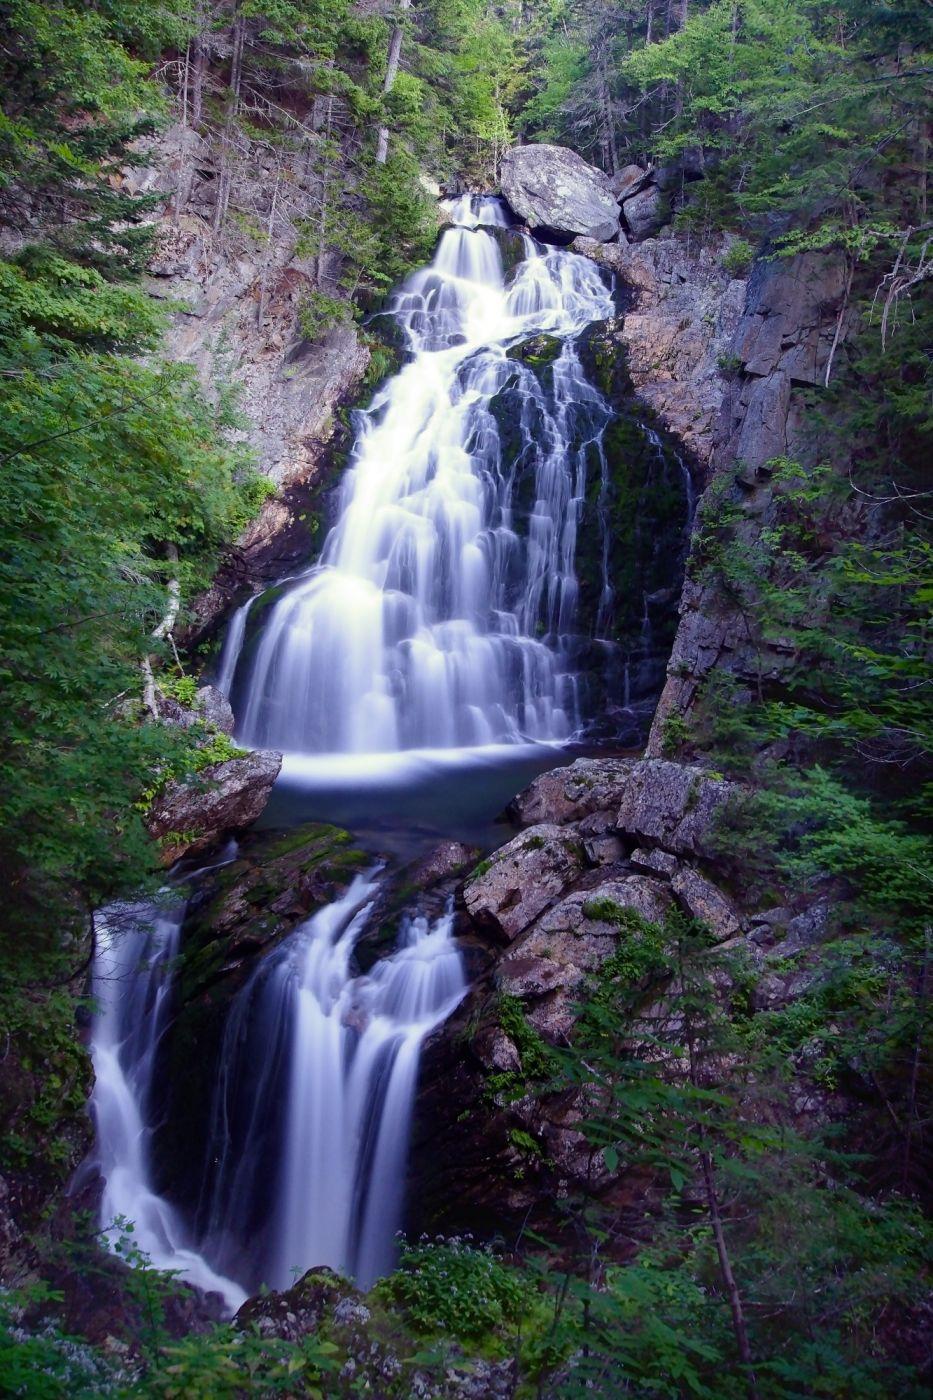 Ellis River Waterfall, USA